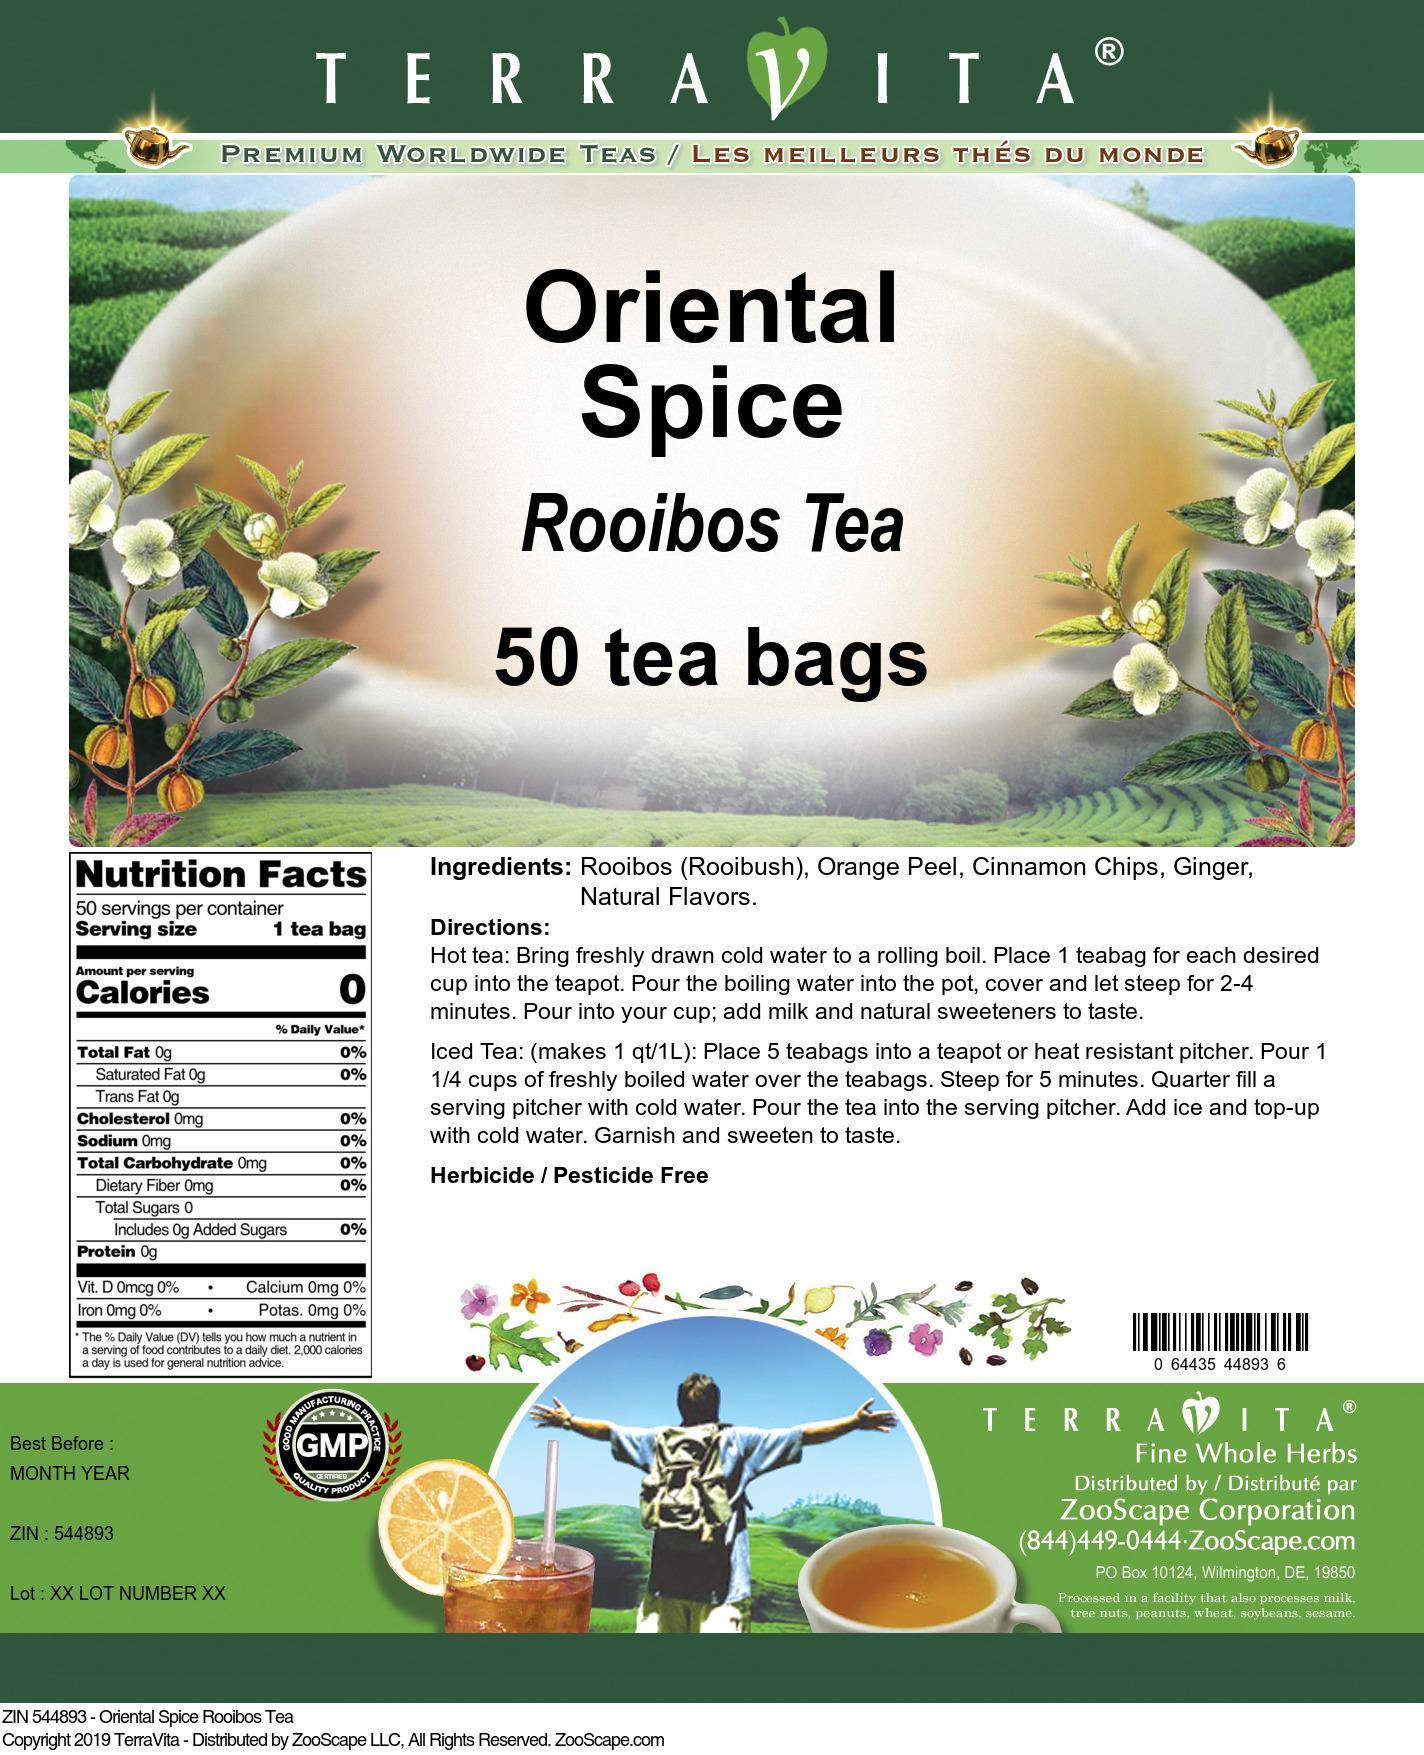 Oriental Spice Rooibos Tea